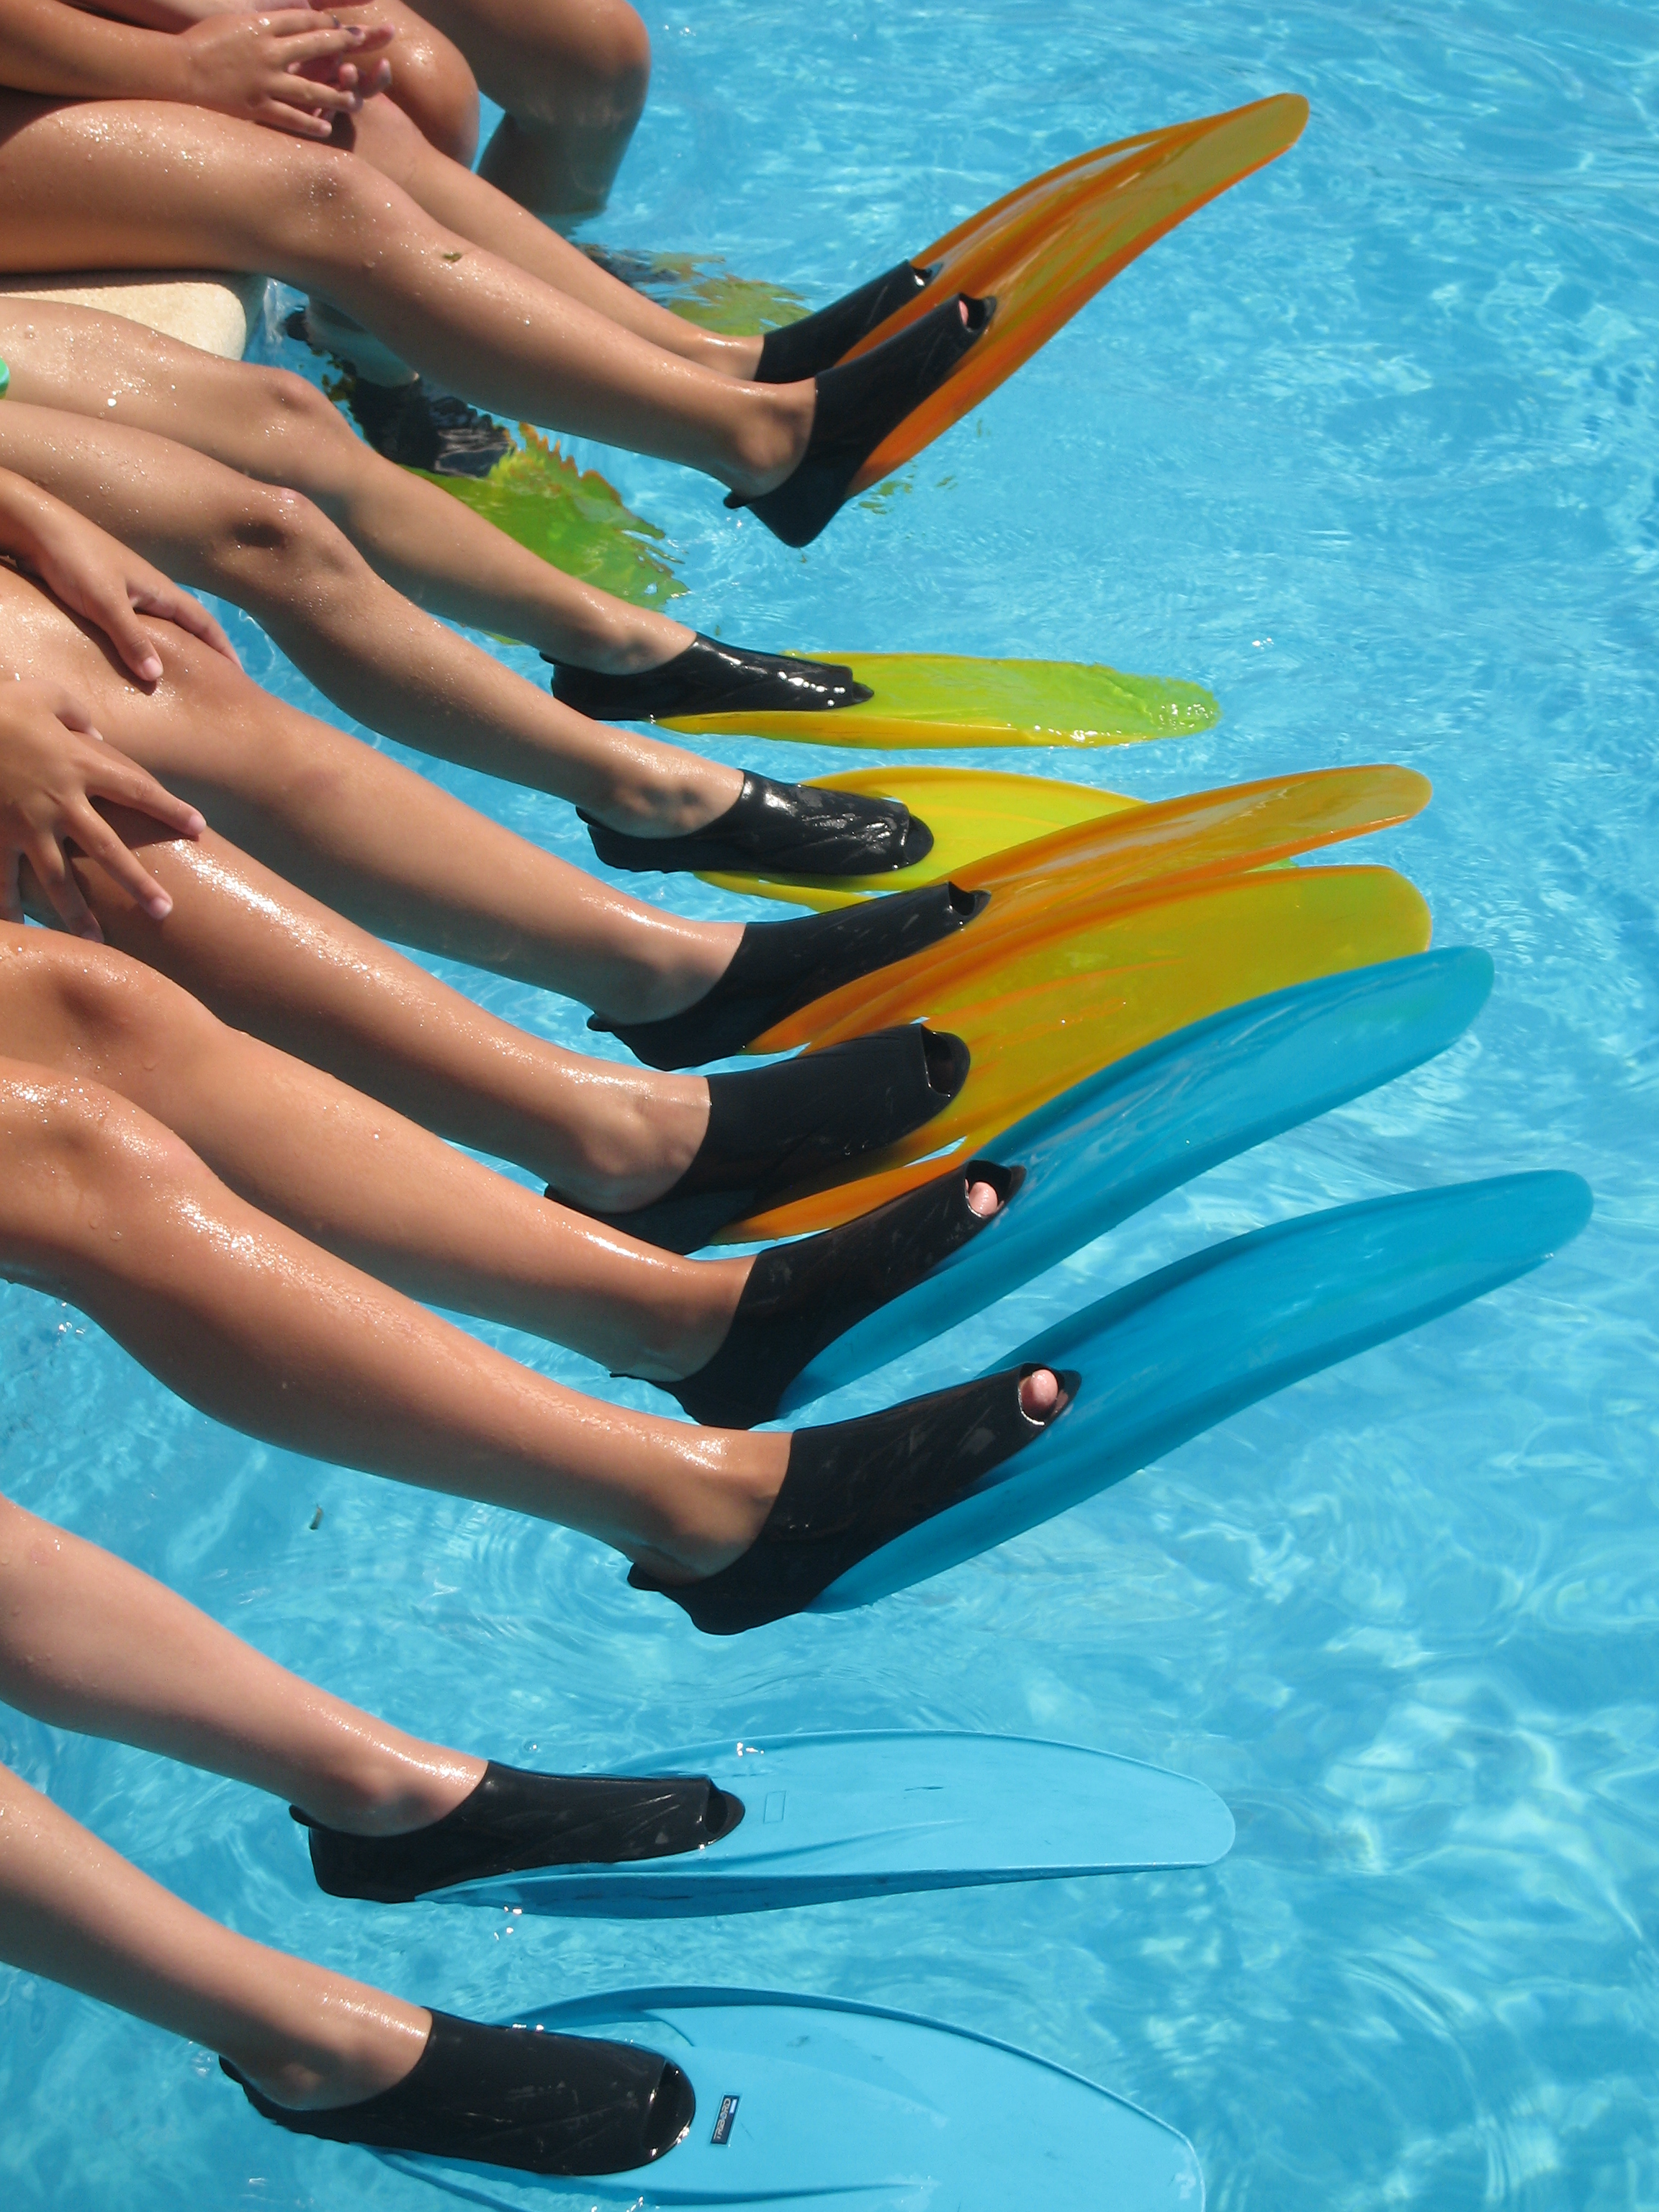 Todo sobre la nataci n otro blog m s for Aletas natacion piscina